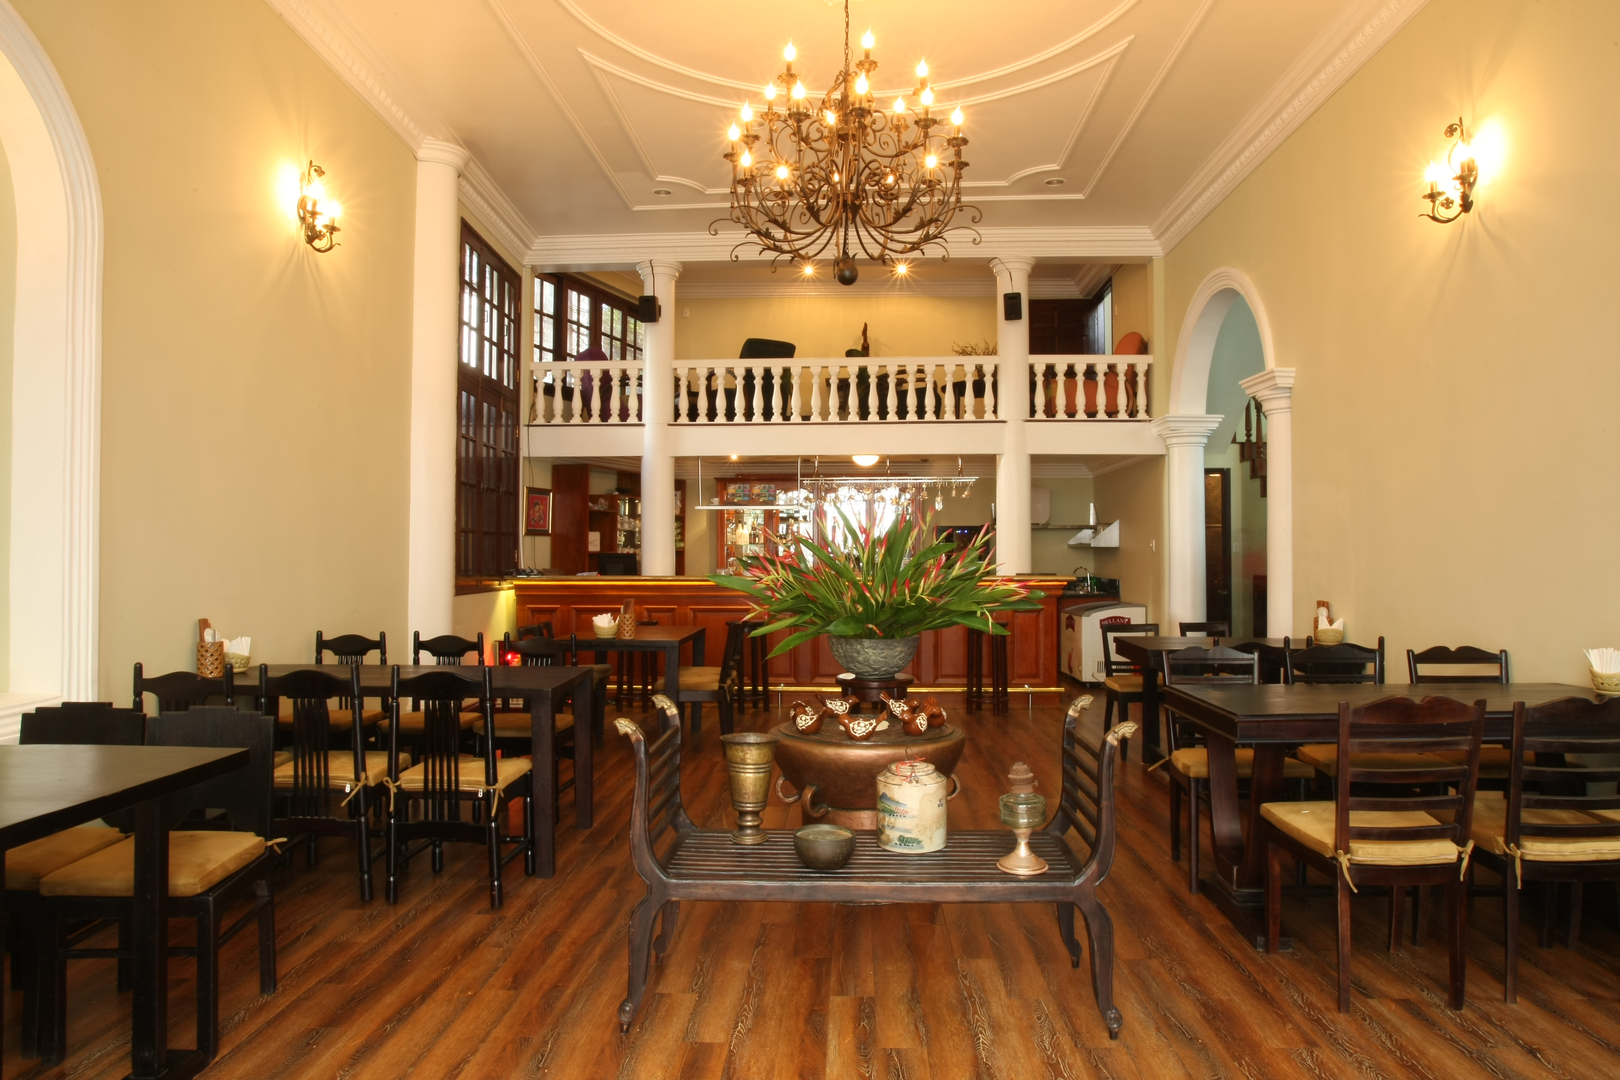 Bloom Saigon Restaurant - Fresh Authentic Vietnamese and